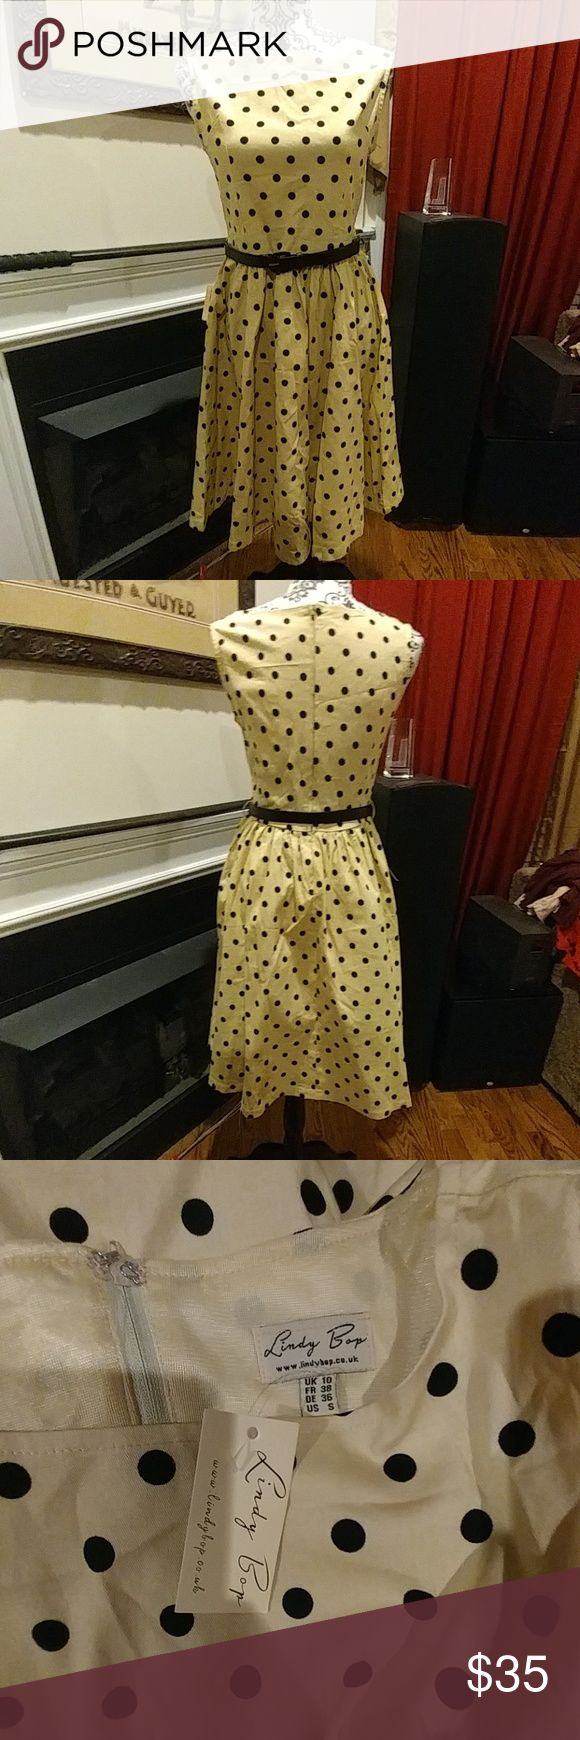 NWT Lindy Bop Mocha Polka Dot Audrey Swing Dress UK 10/US 6. True to size. Pinup, retro, tea dress, party dress, vintage style, rockabilly. Functional pockets! Modcloth Dresses Midi